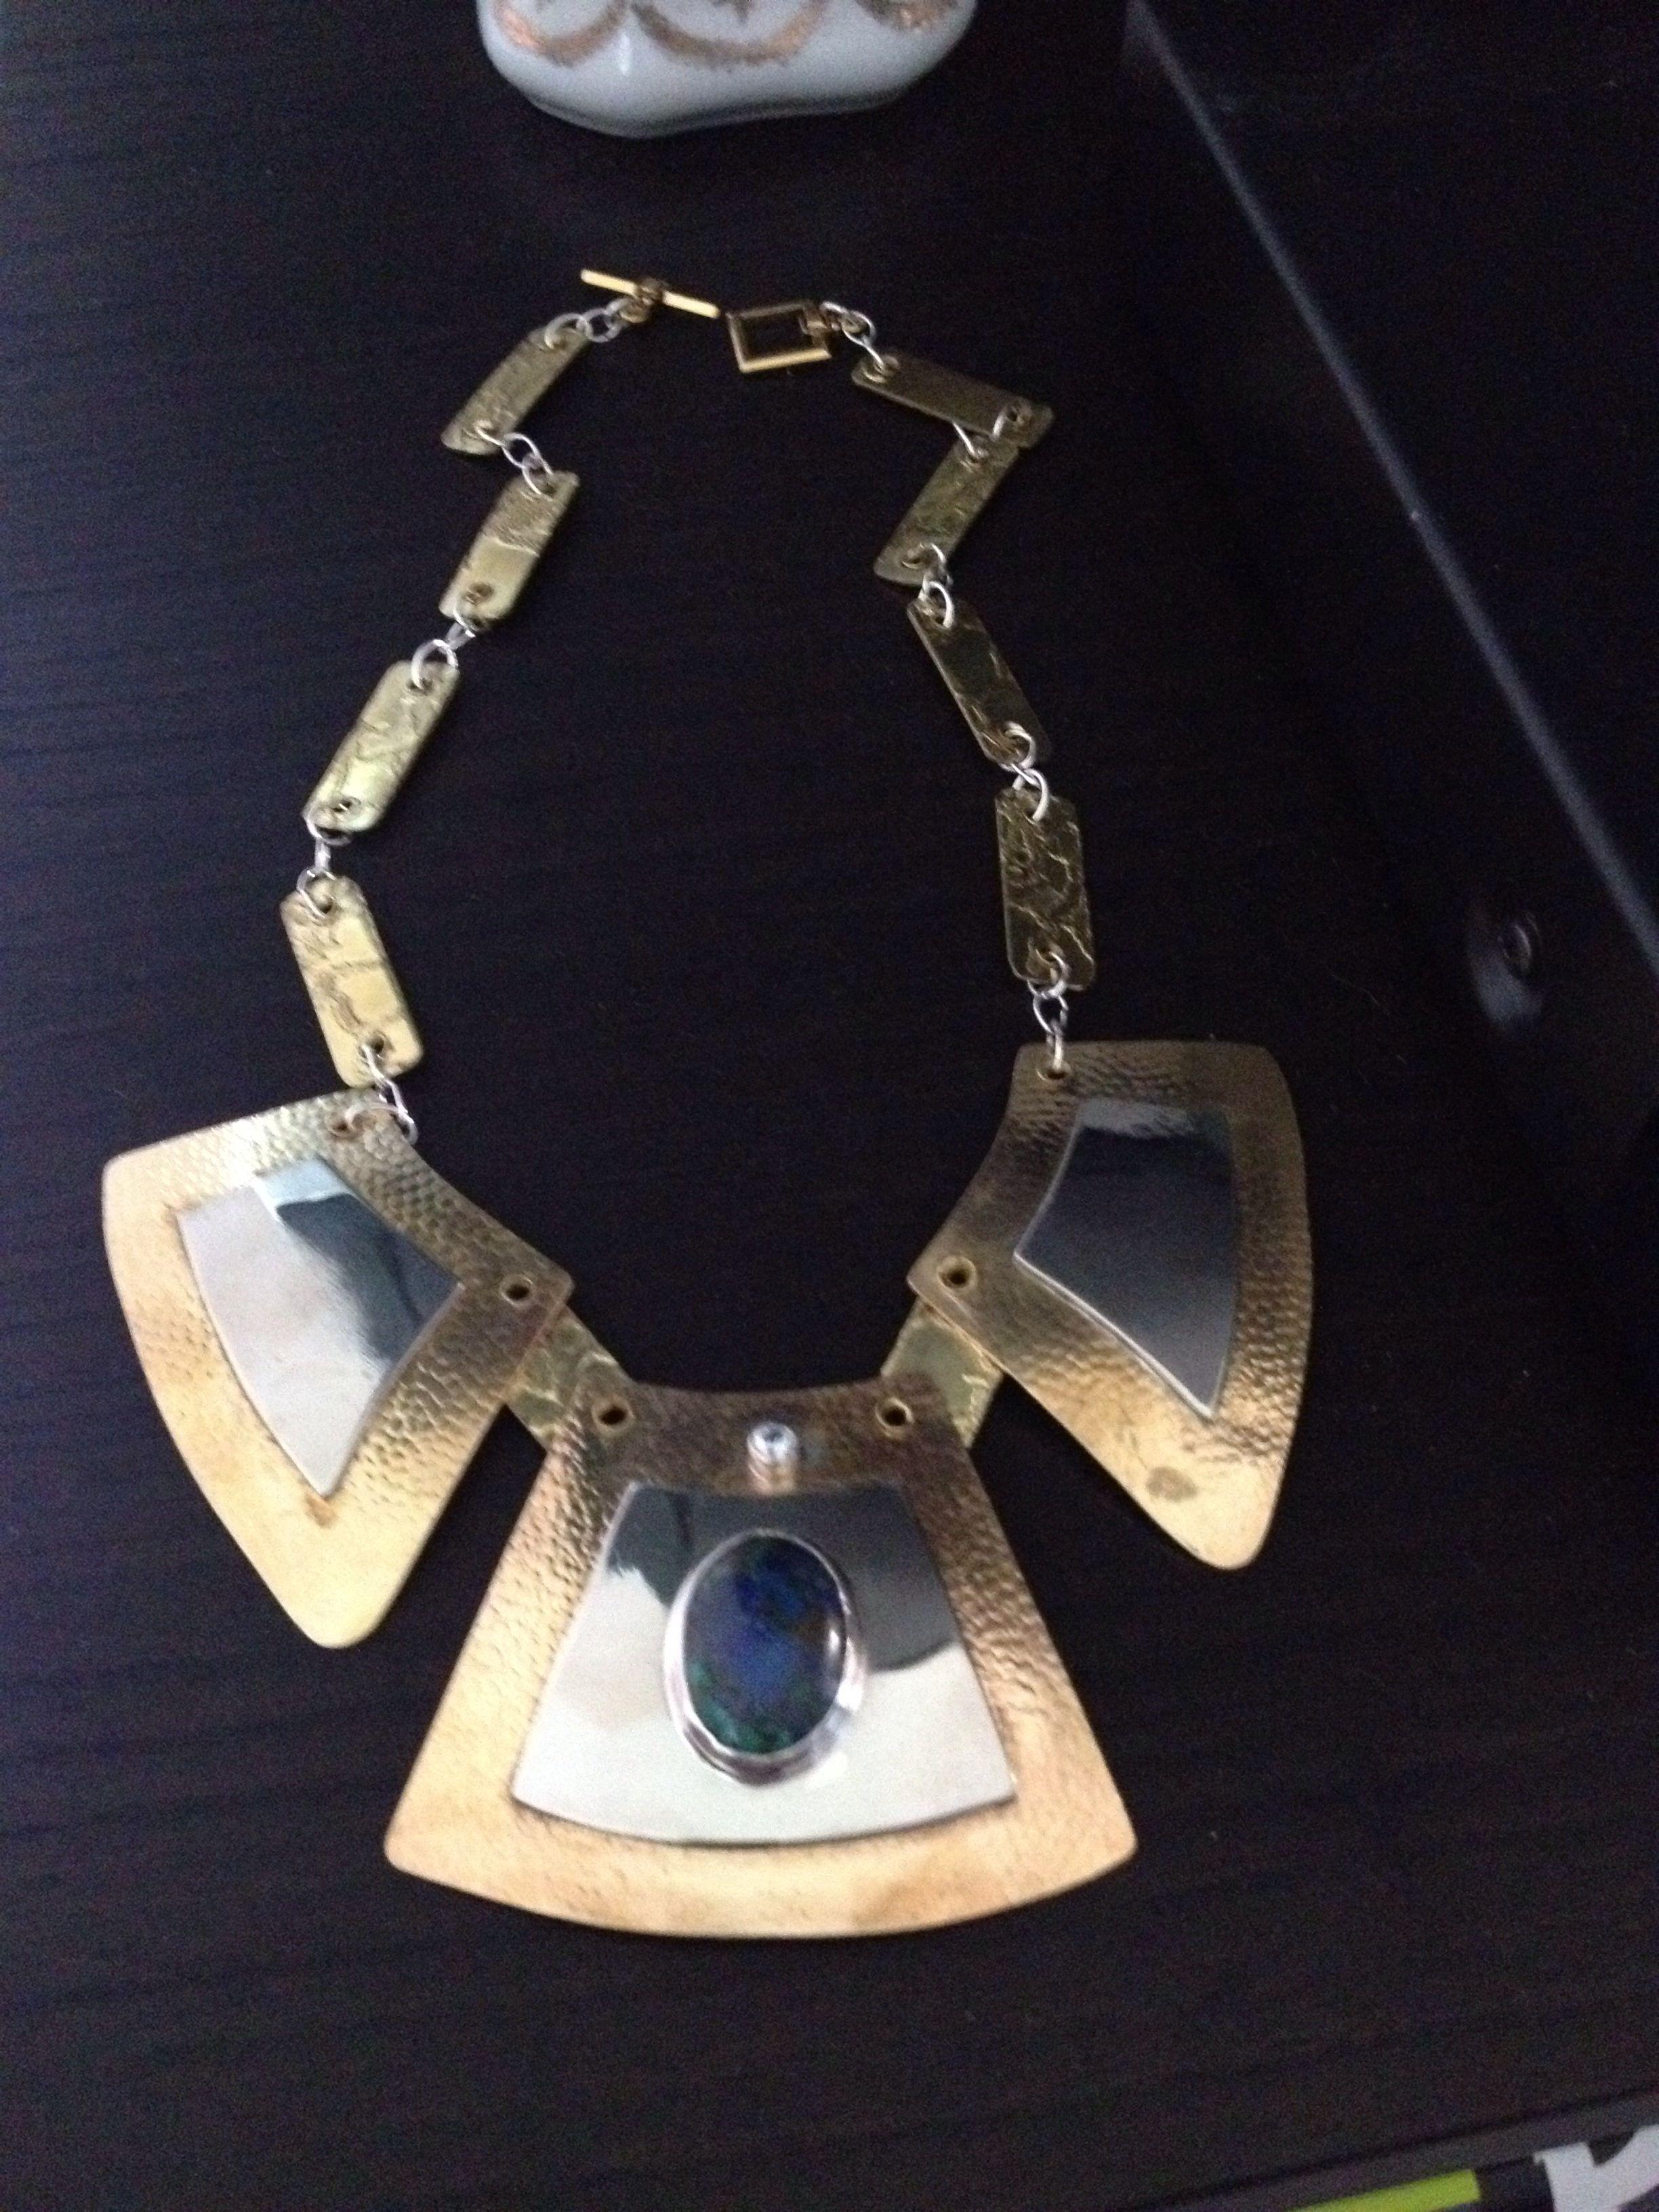 Brass and nickel necklace w/ blue stone